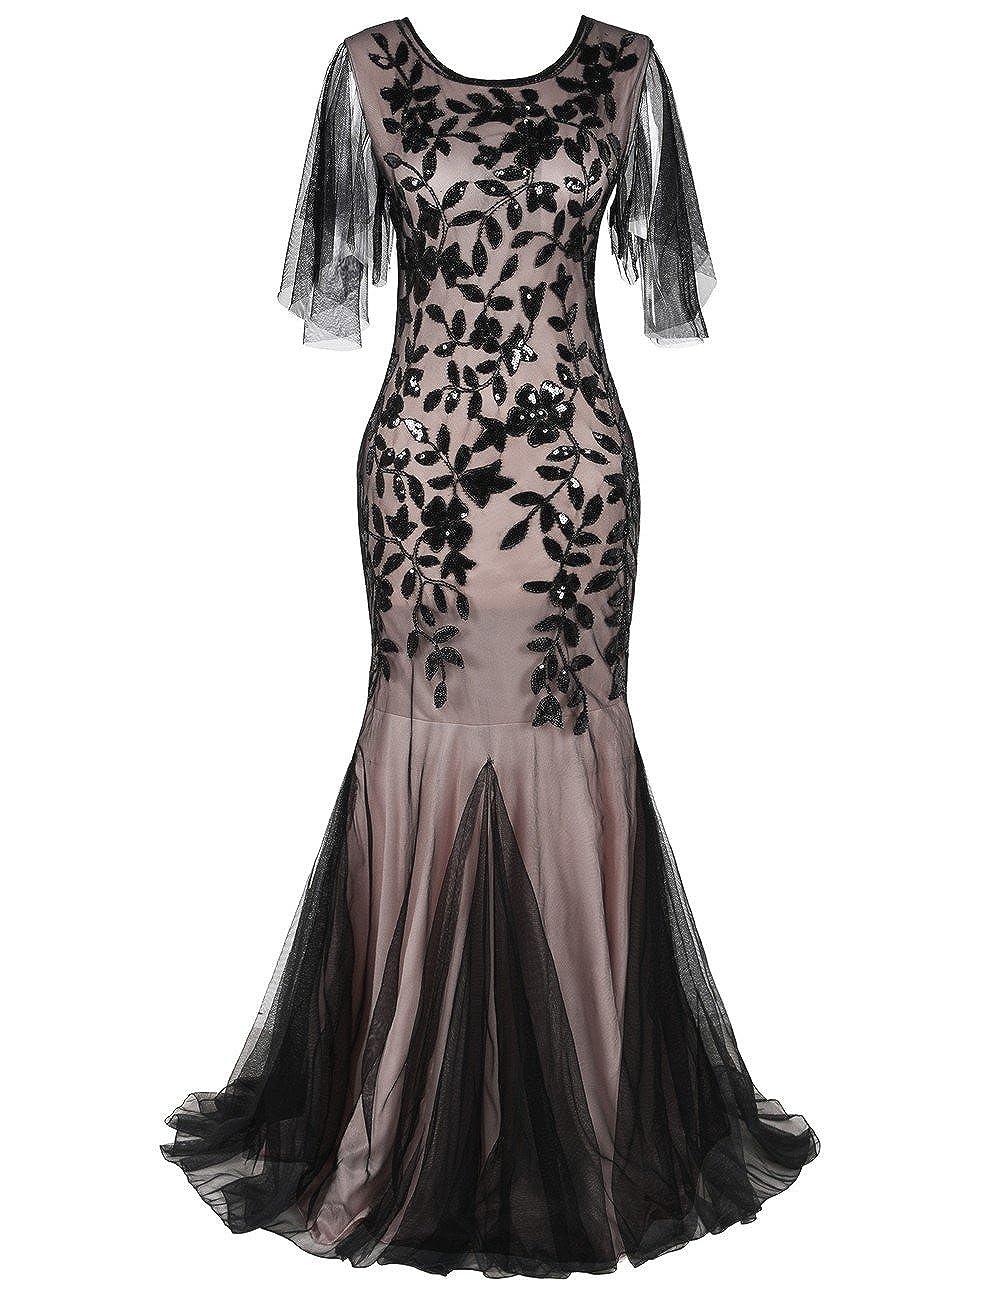 a55f58be9271 kayamiya Women's 1920s Maxi Long Prom Gowns Sequin Mermaid Hem Evening Dress  with Sleeves: Amazon.co.uk: Clothing